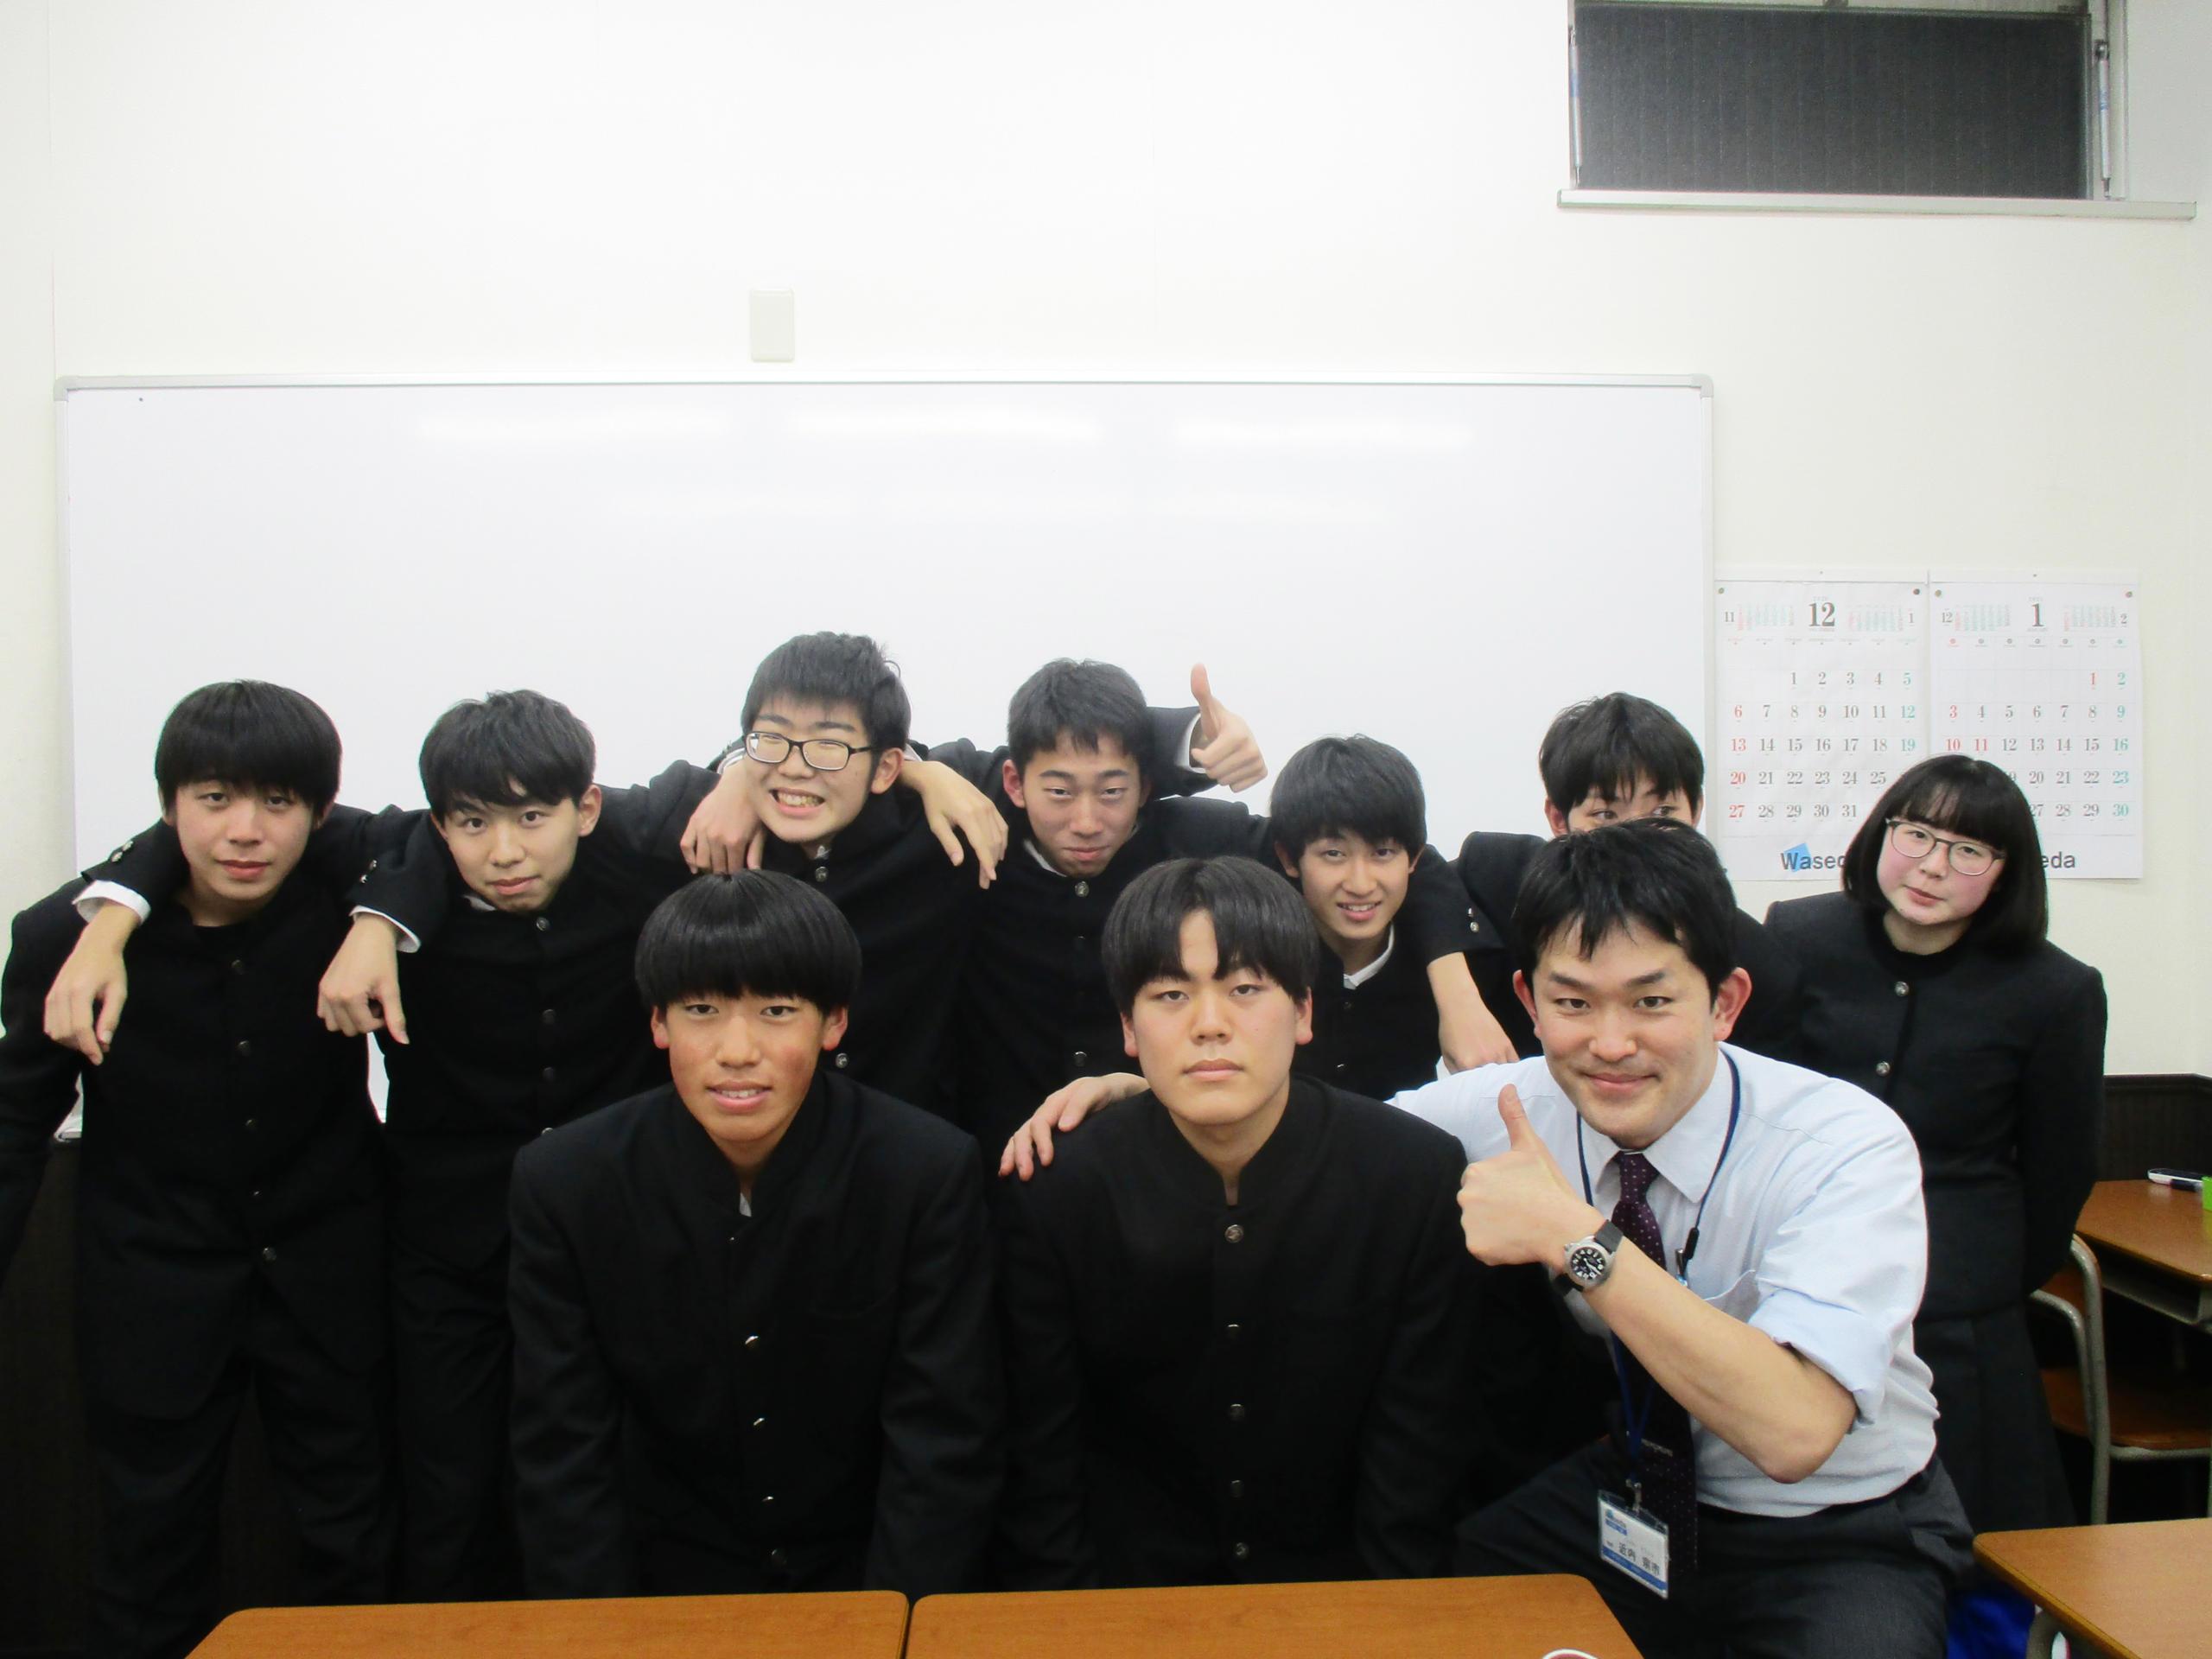 W早稲田ゼミ 伊勢崎ハイスクール